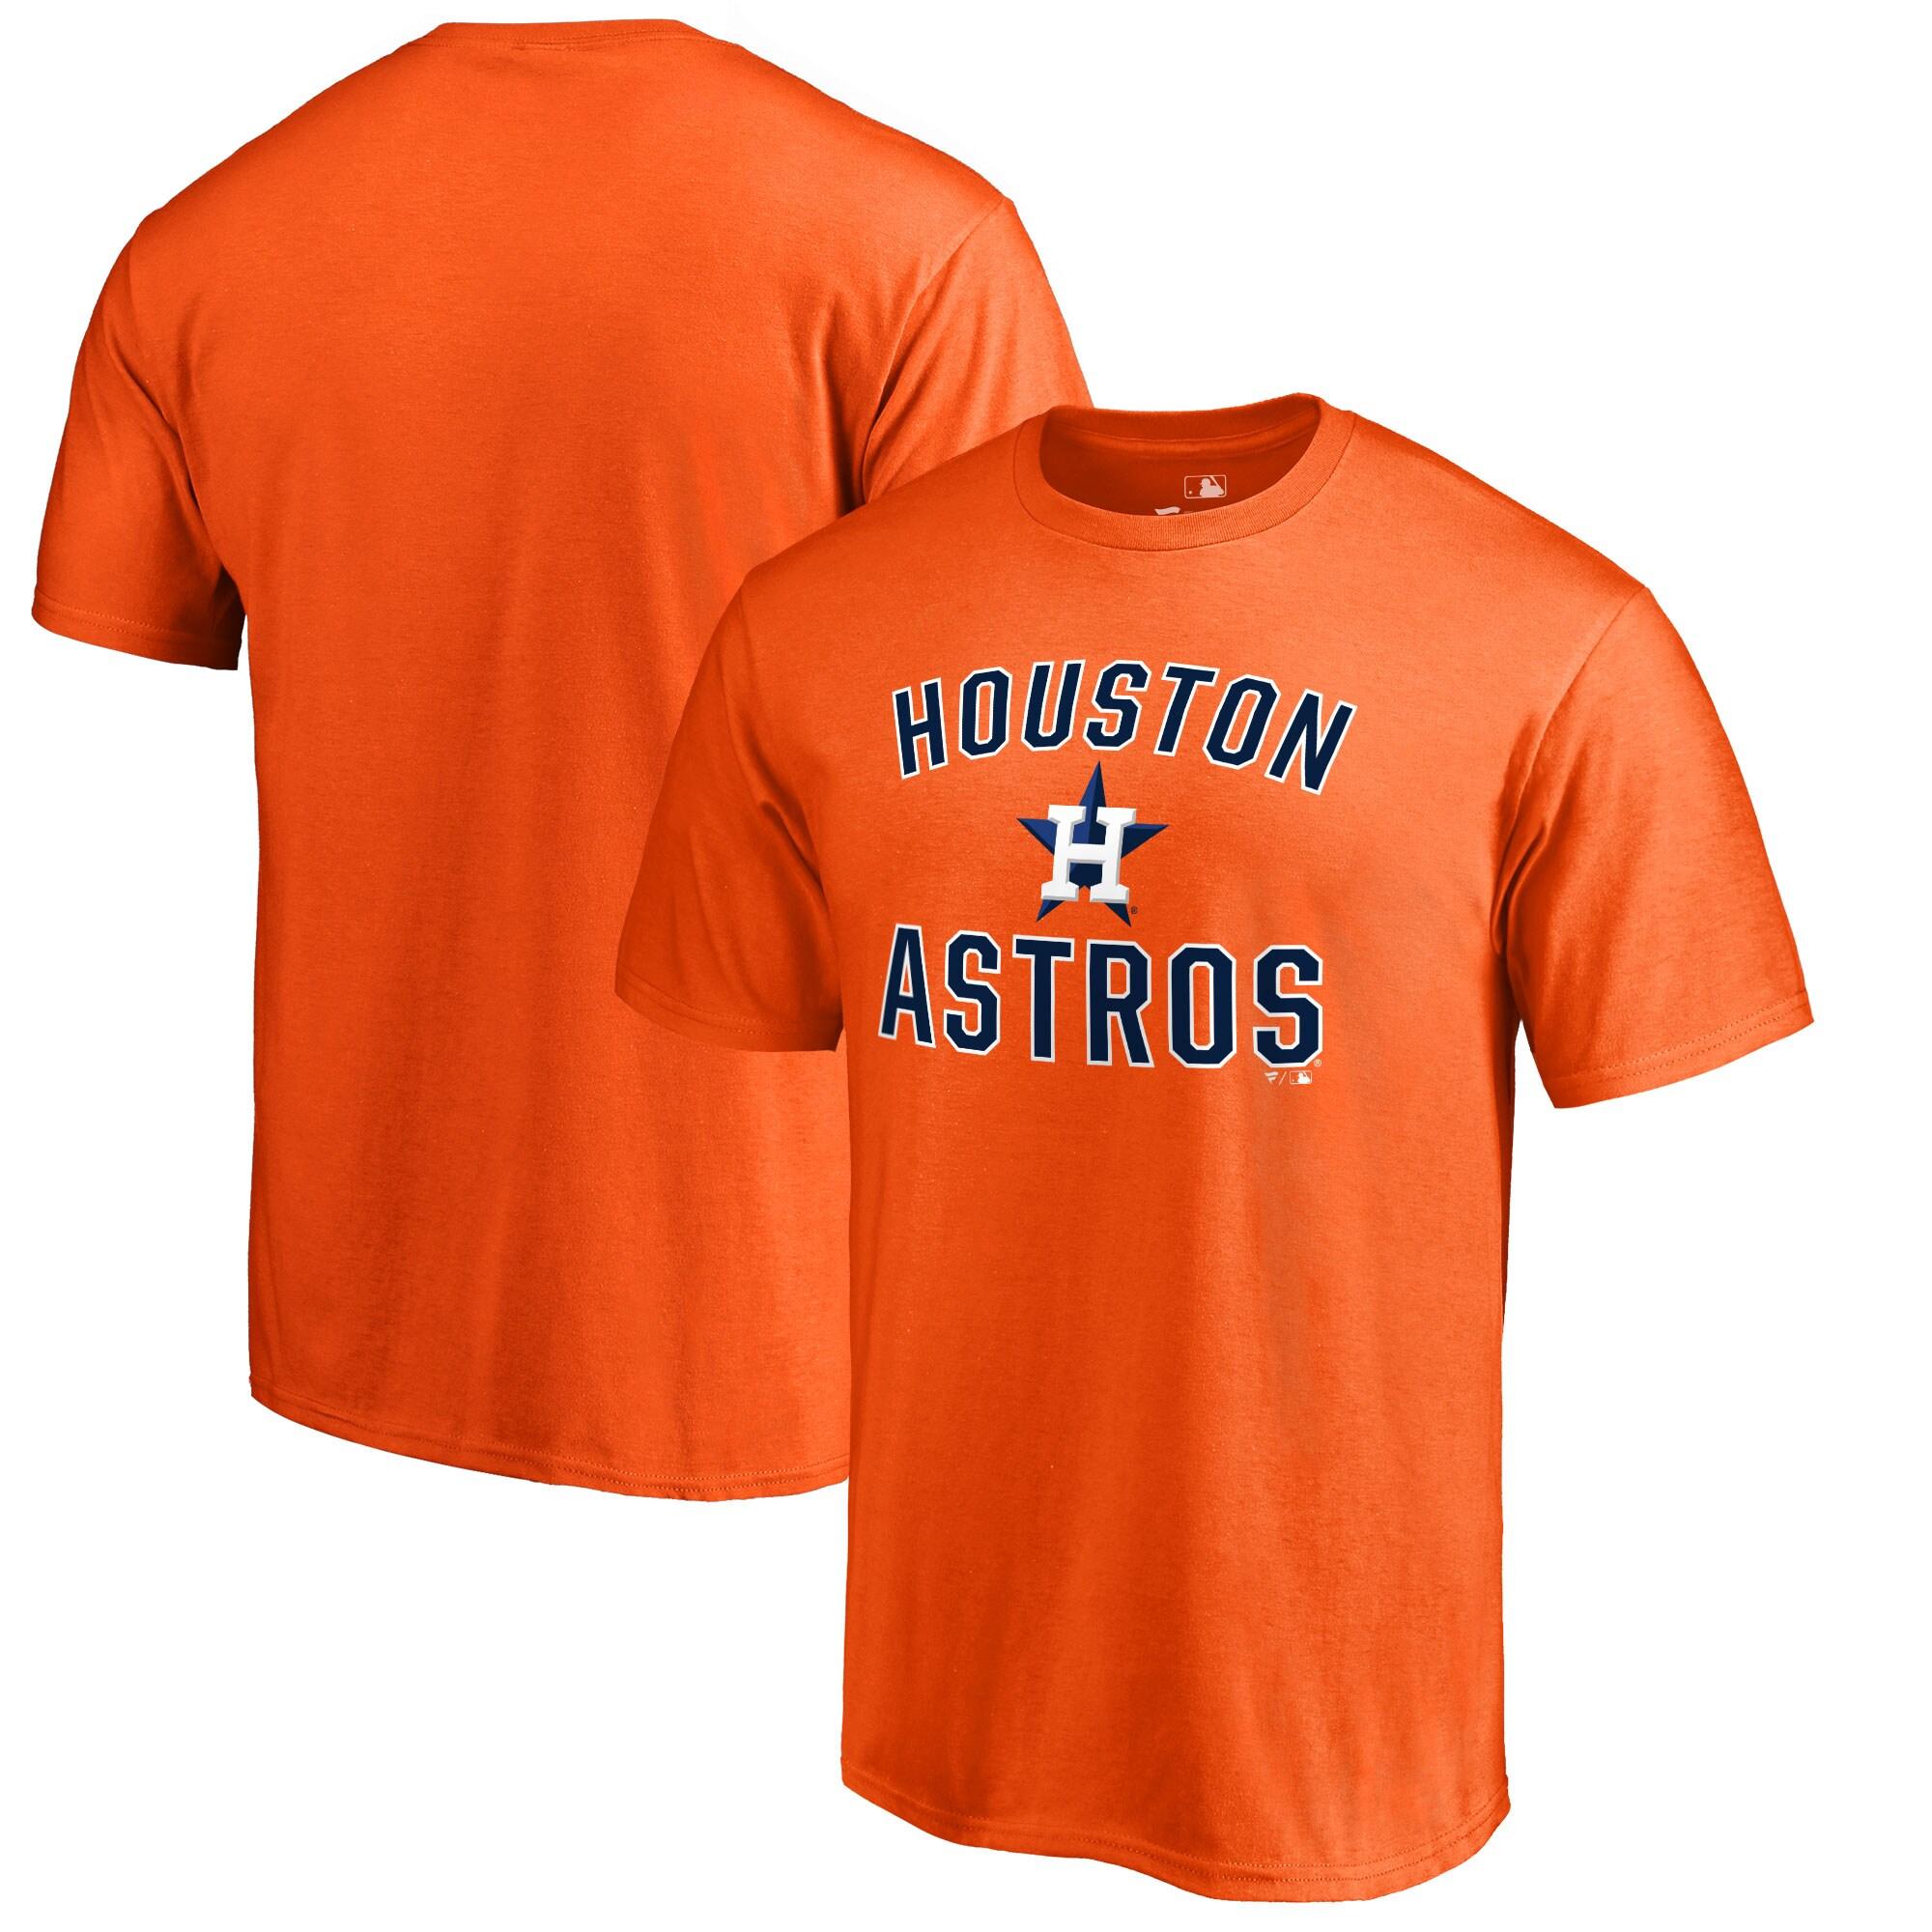 Houston Astros Victory Arch T-Shirt - Orange